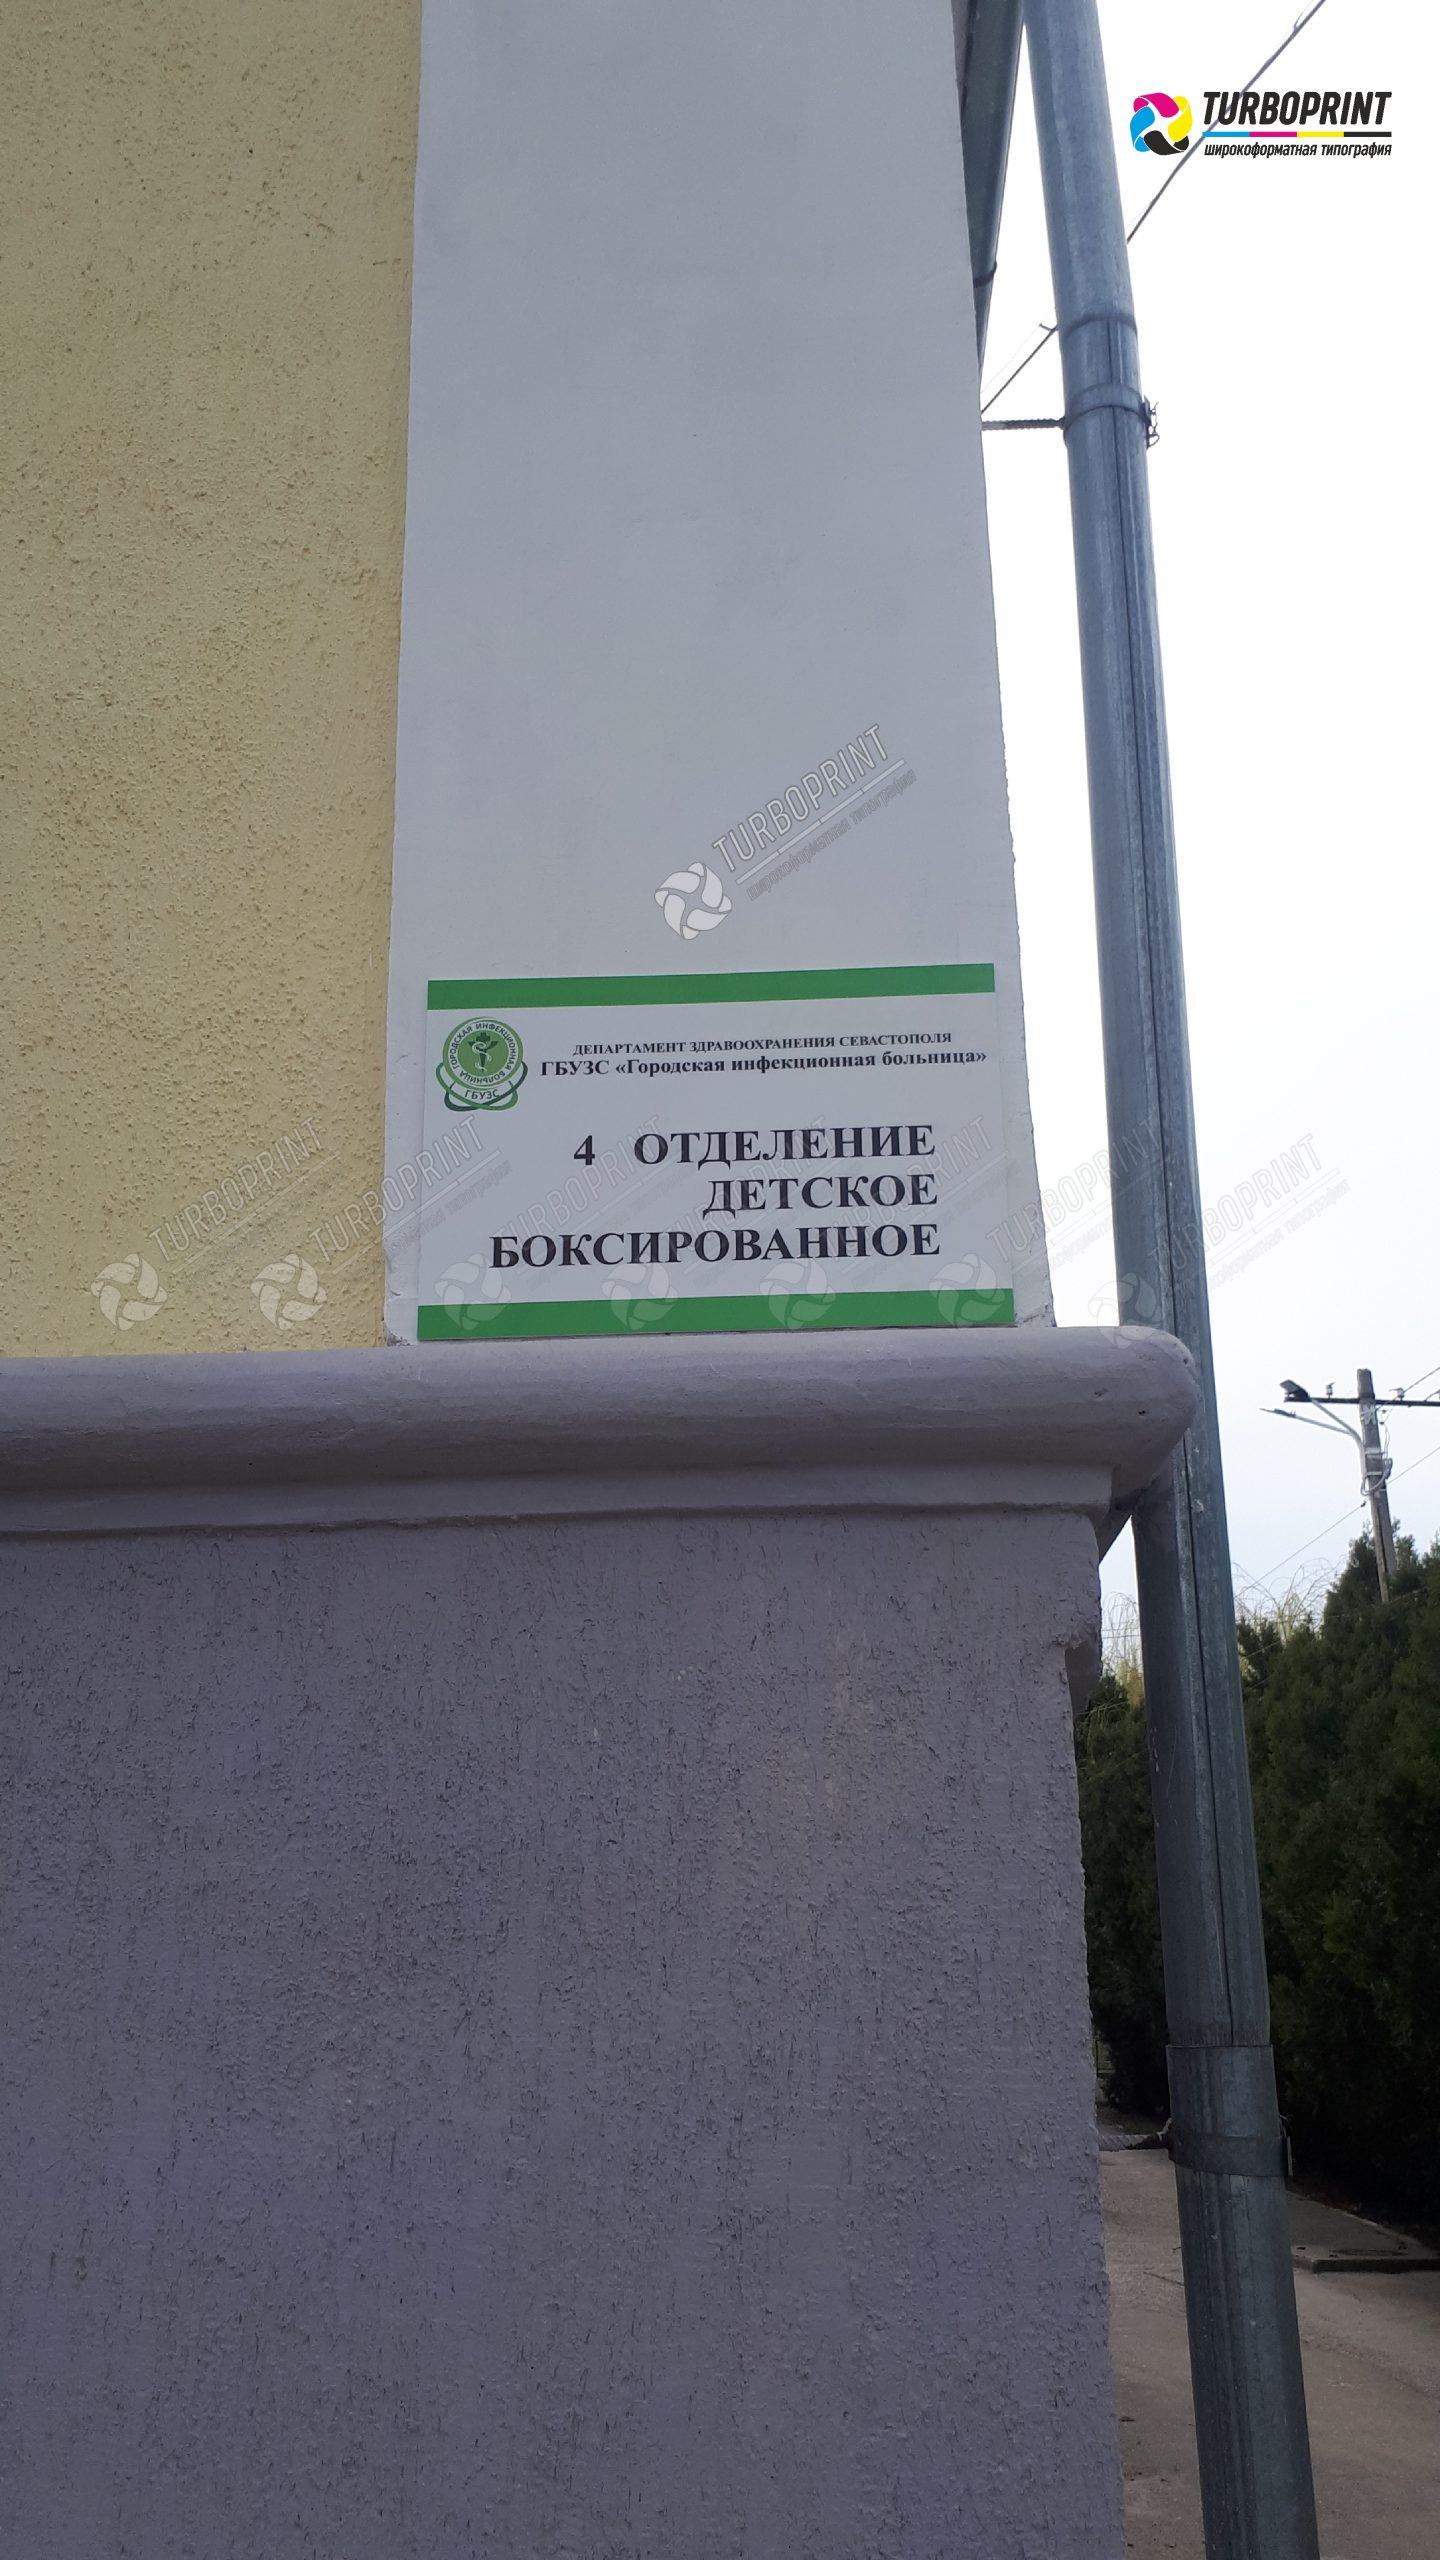 uf-pechat-na-pvh-yalta